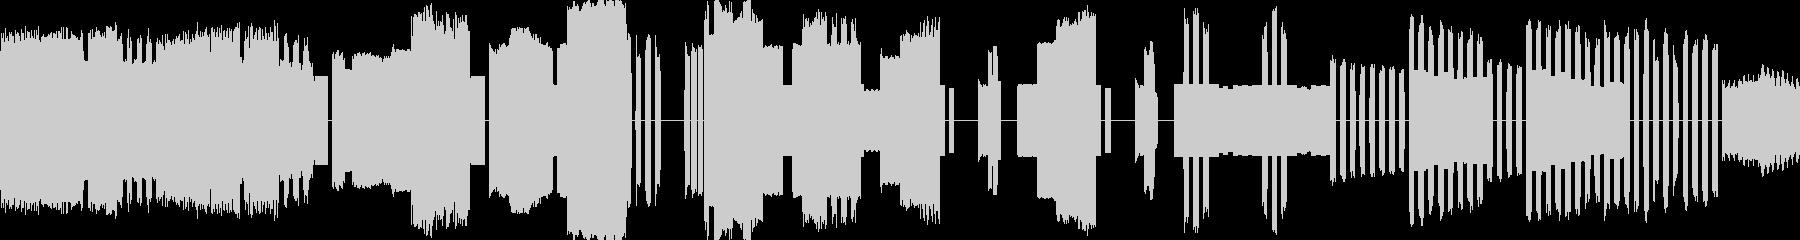 8bit・ループ・洞窟・ラストダンジョンの未再生の波形